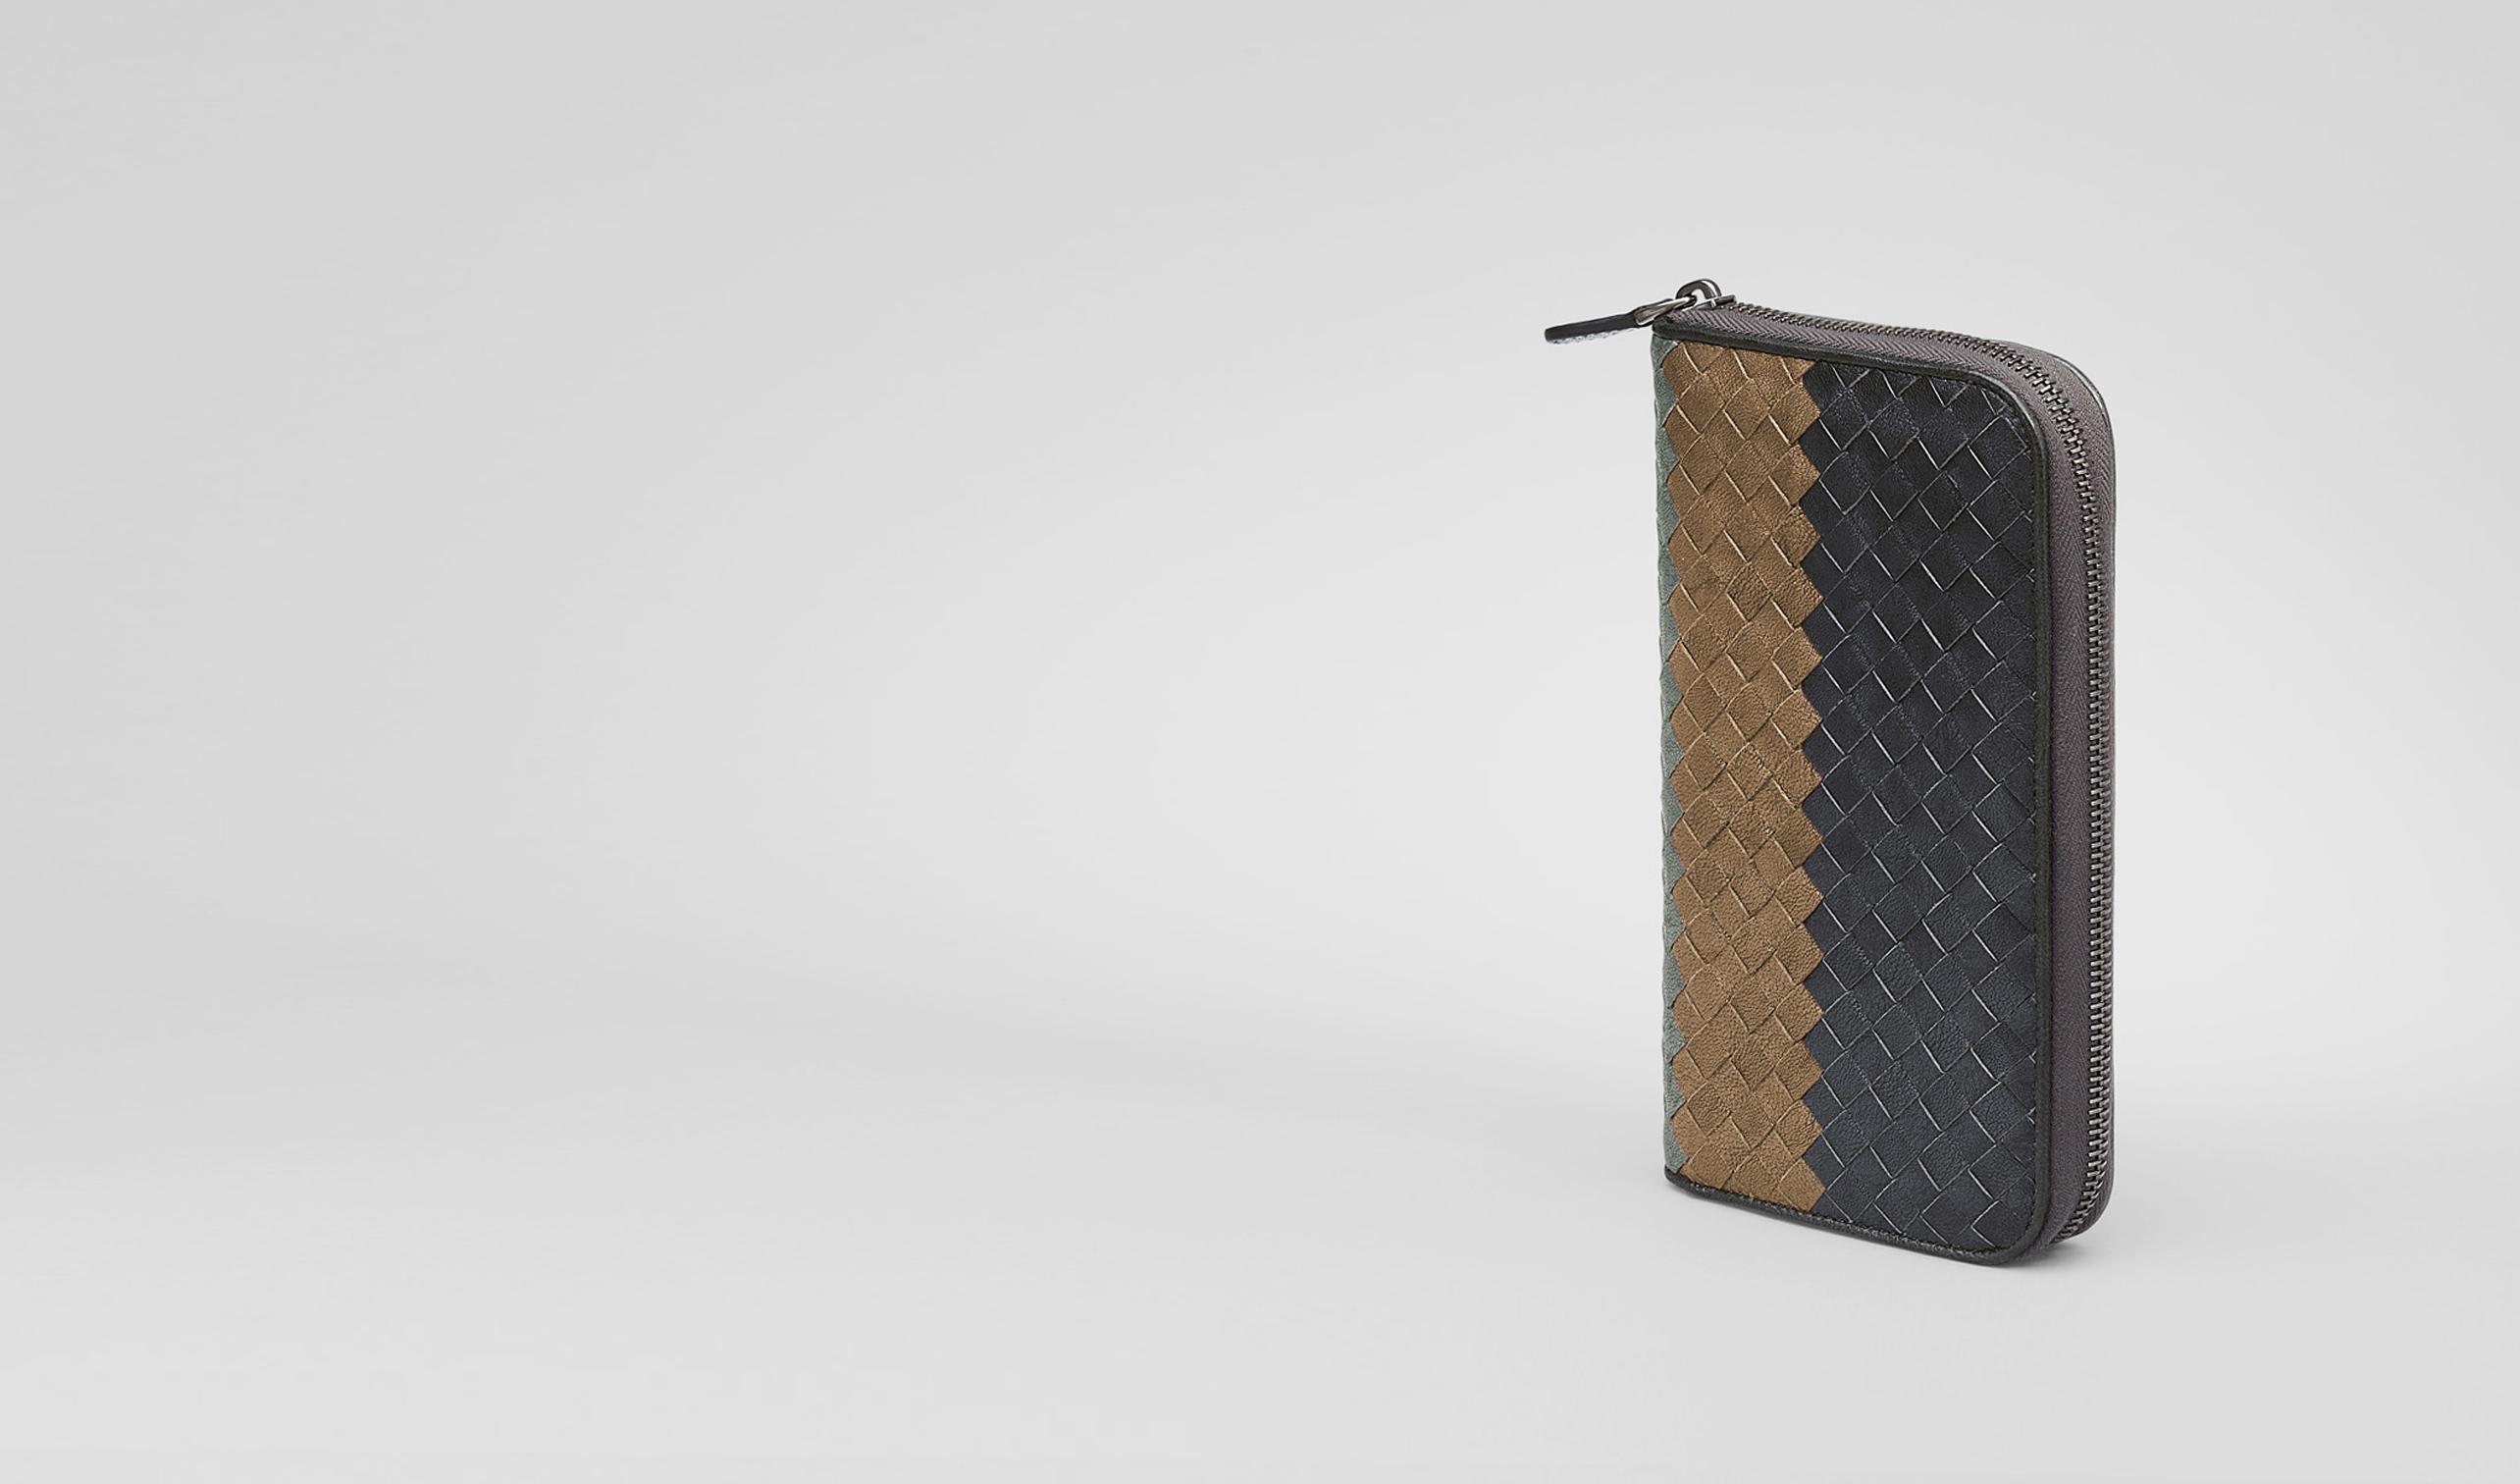 BOTTEGA VENETA Zip Around Wallet U Ardoise Bronze Frontiere Intrecciato Club Fume Zip Around Wallet pl